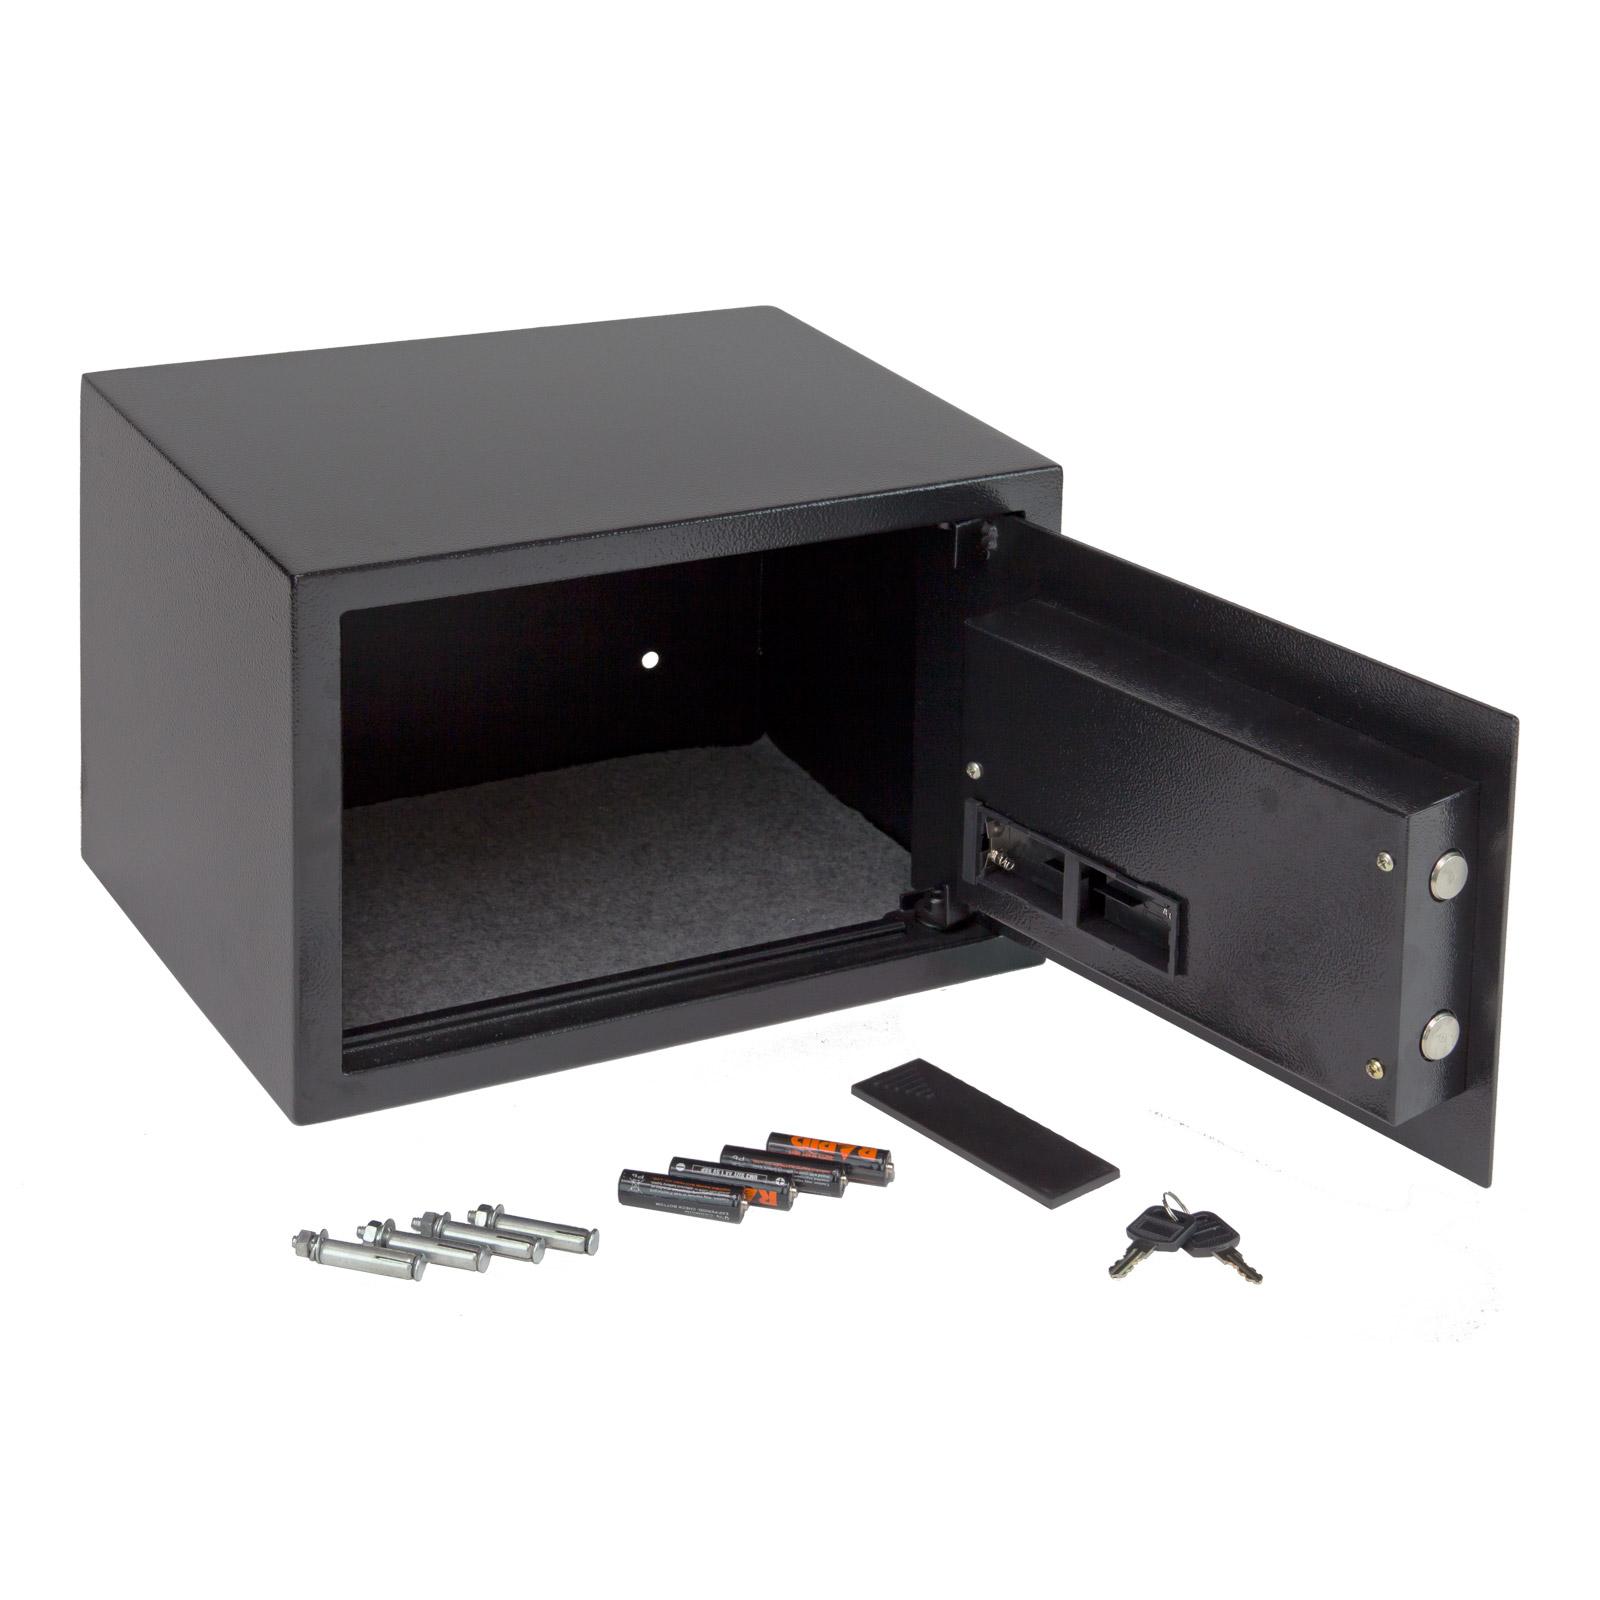 m beltresor digital zahlenschloss schl ssel safe wandtresor geldschrank 20955 ebay. Black Bedroom Furniture Sets. Home Design Ideas